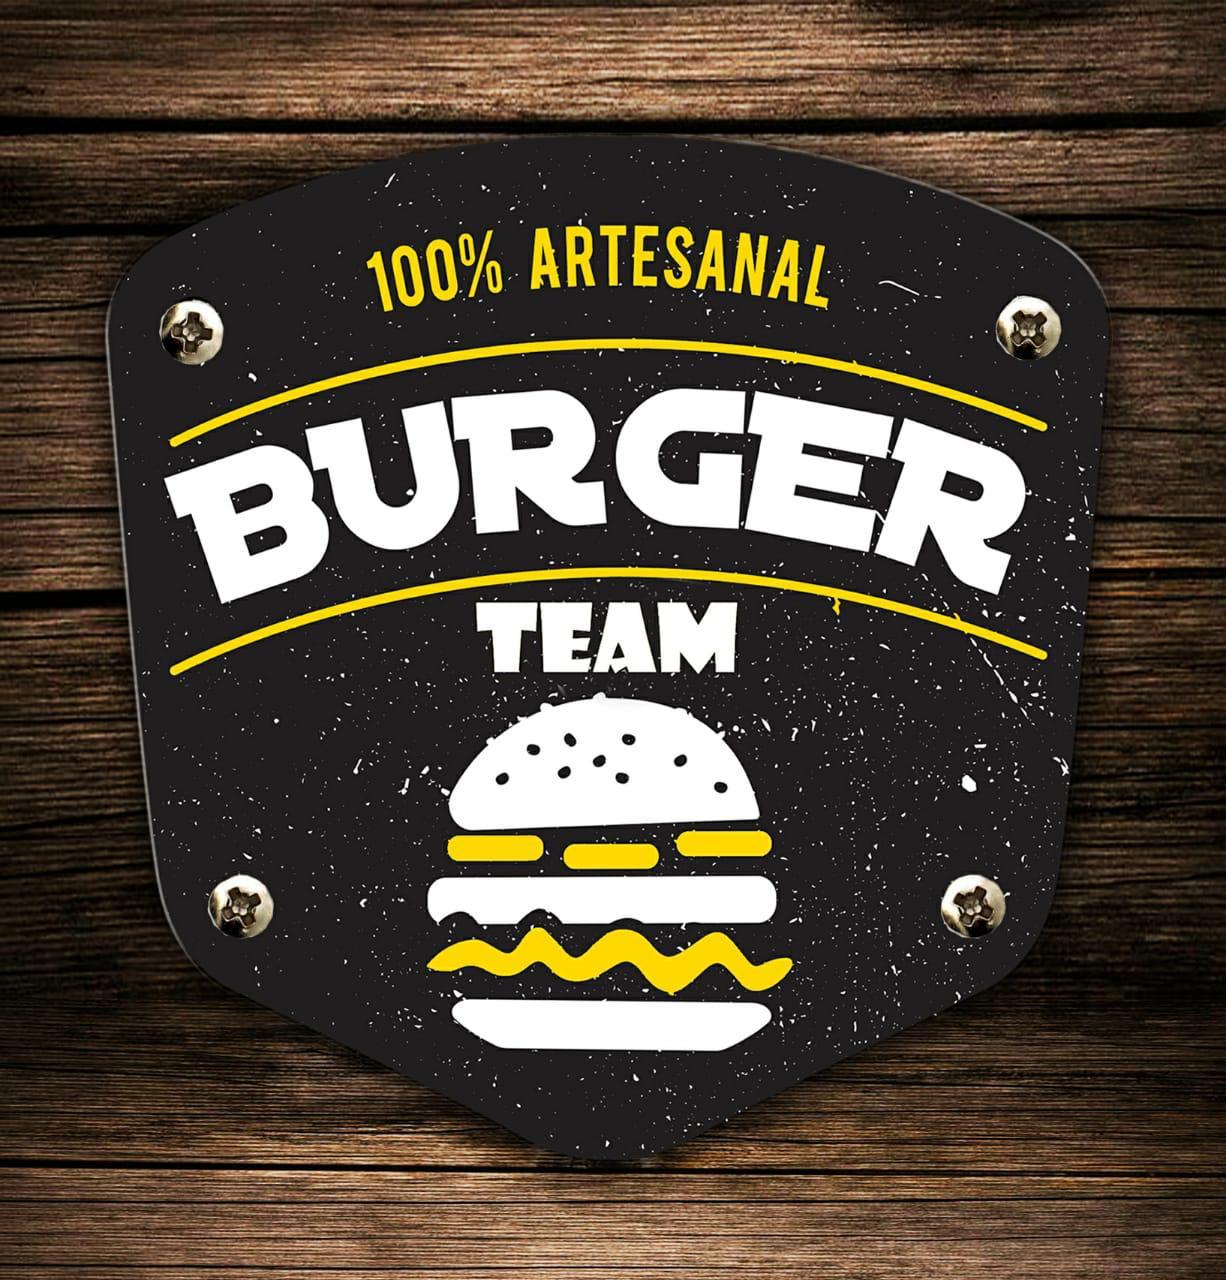 Burger Team